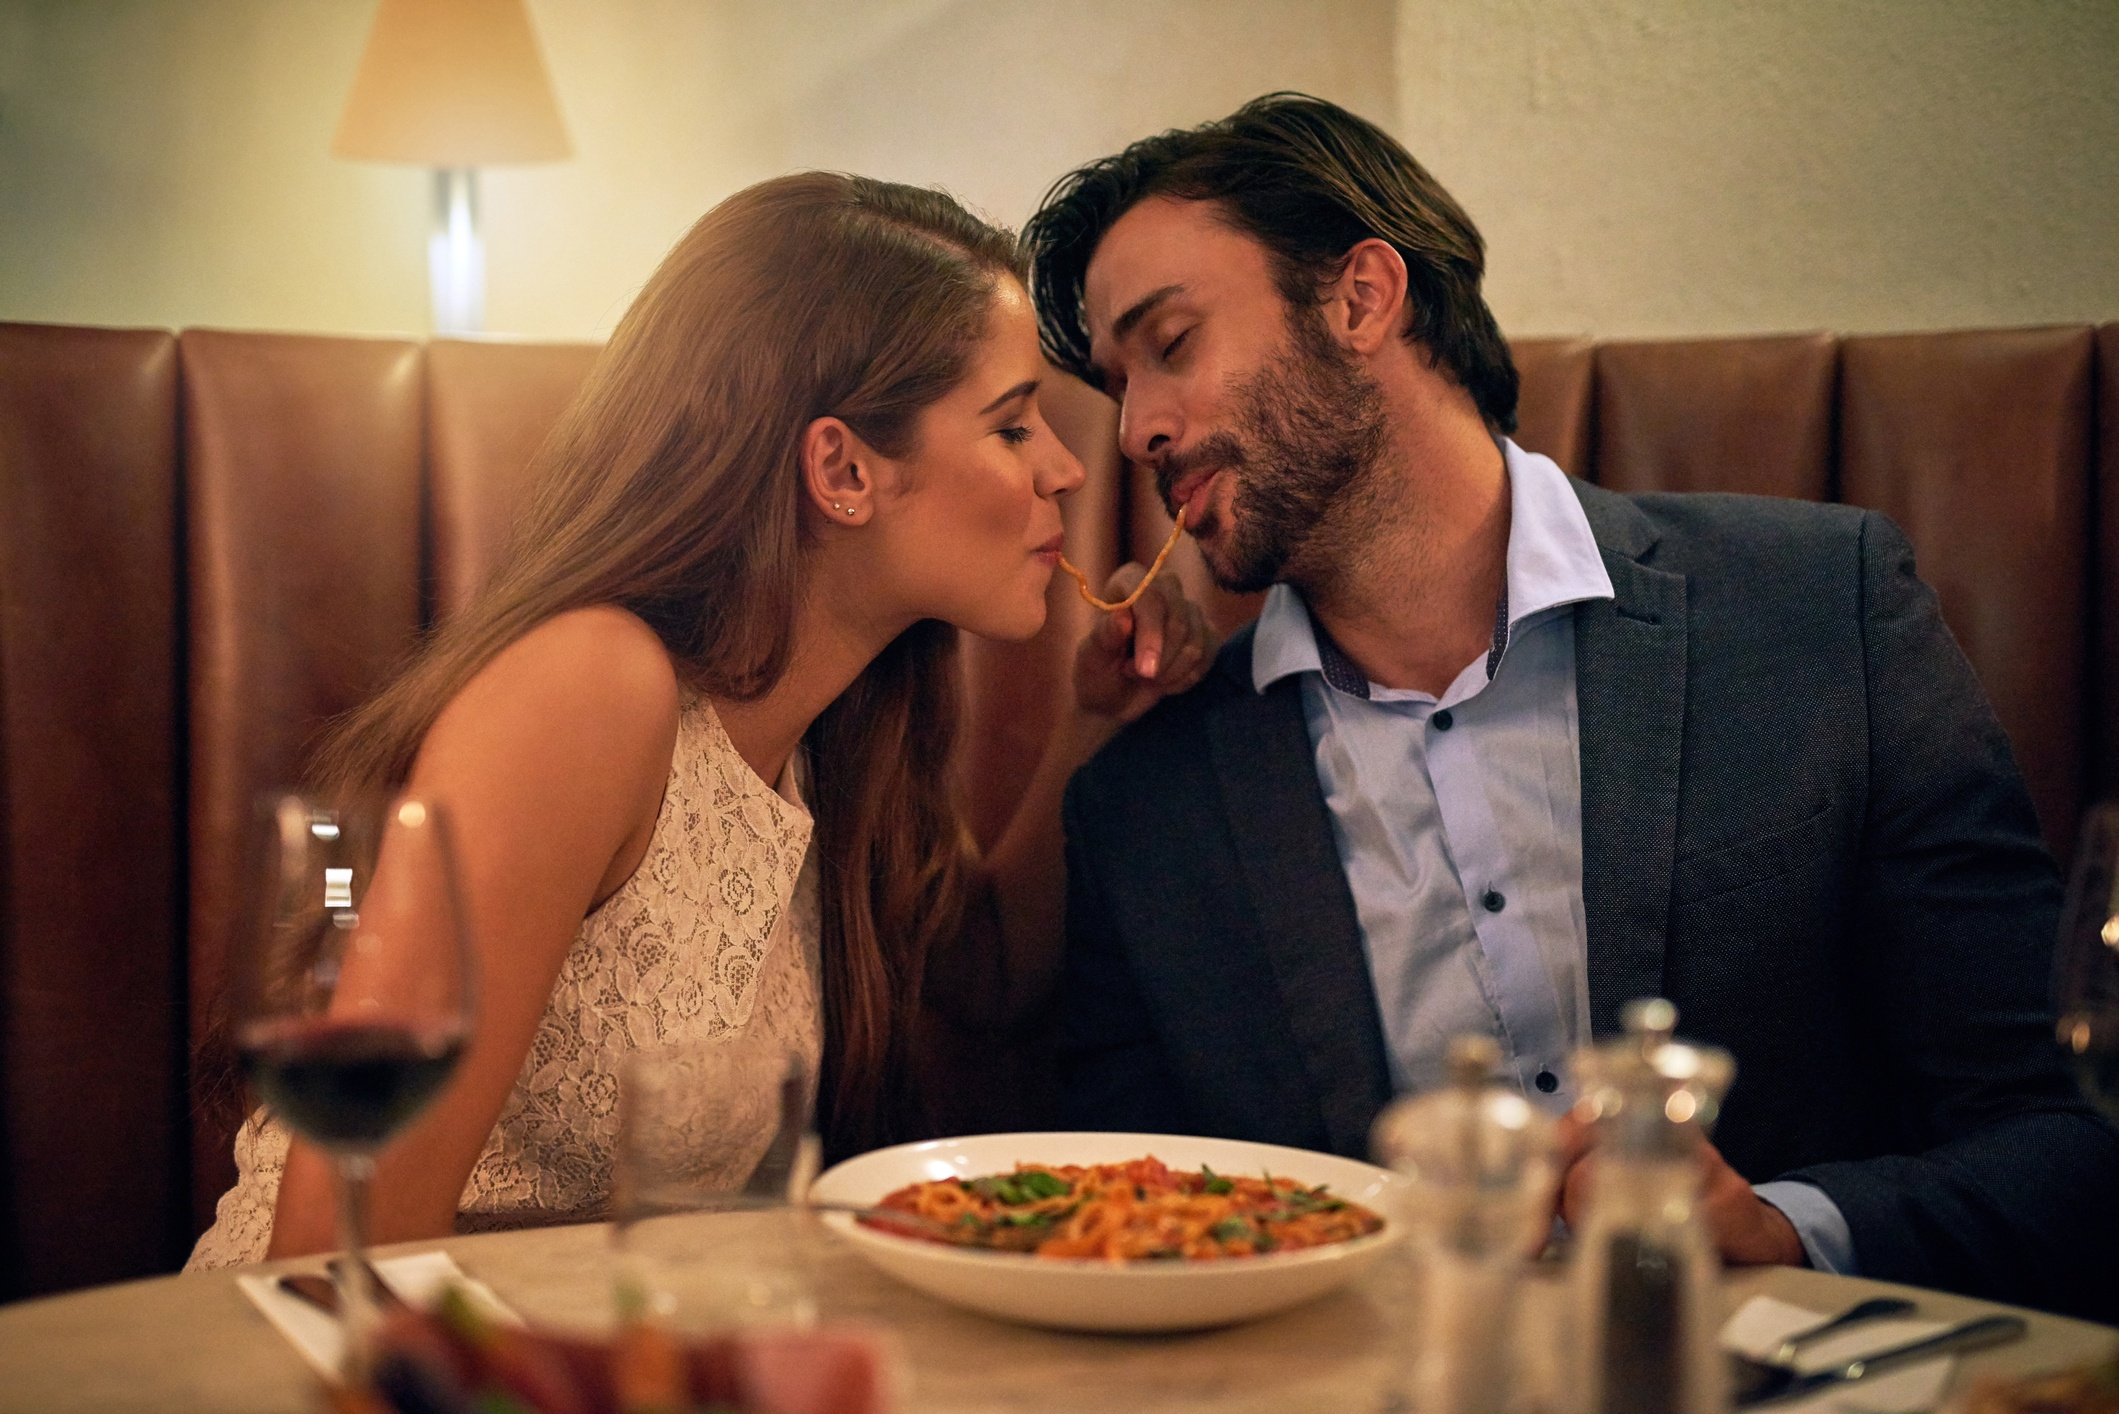 Couple share spaghetti on romantic date